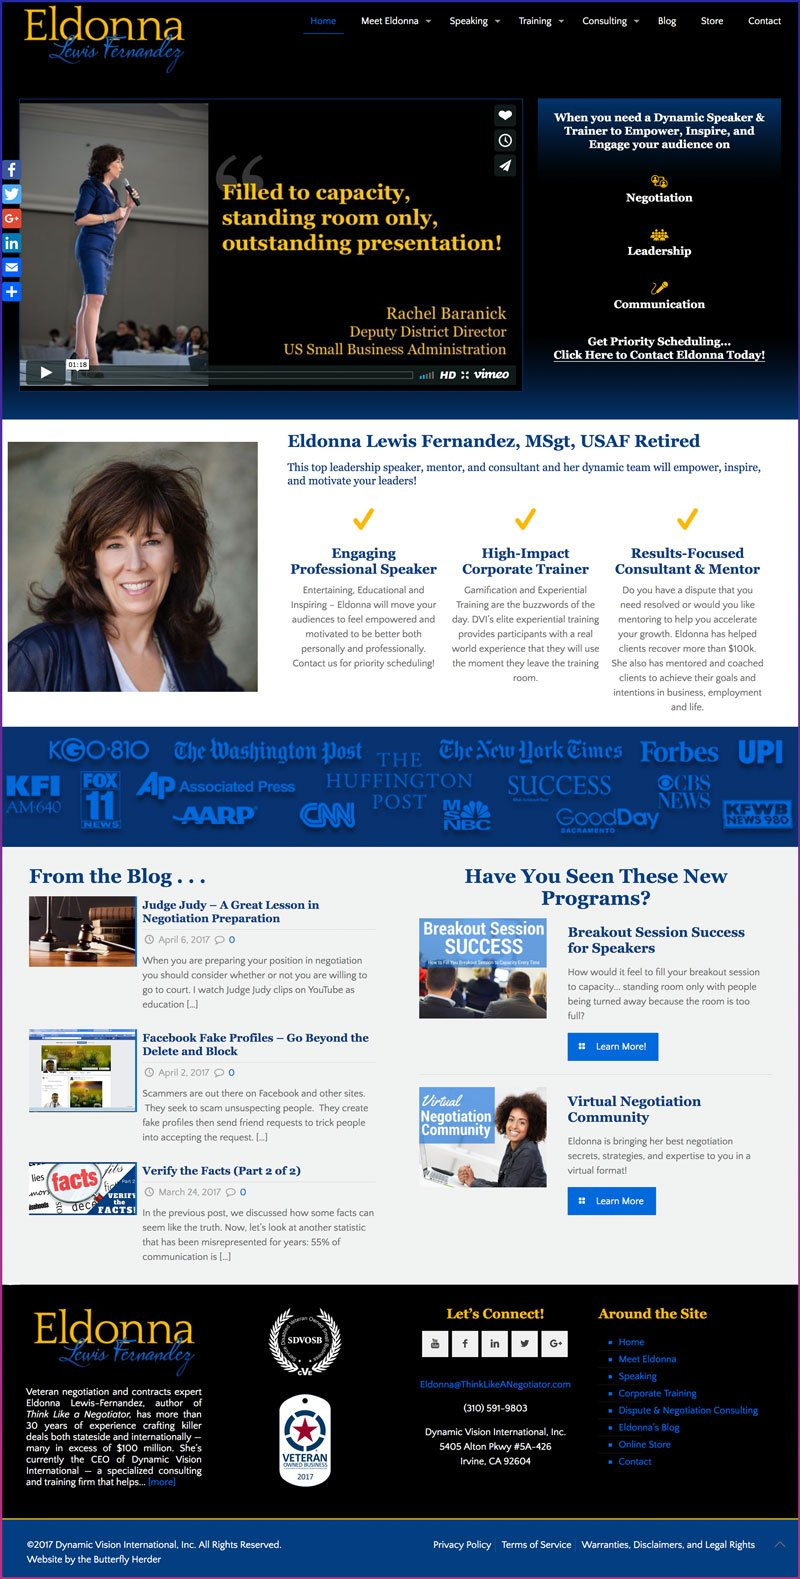 Eldonna Lewis Fernandez, Accredited Speaker, Author, Negotiations Expert